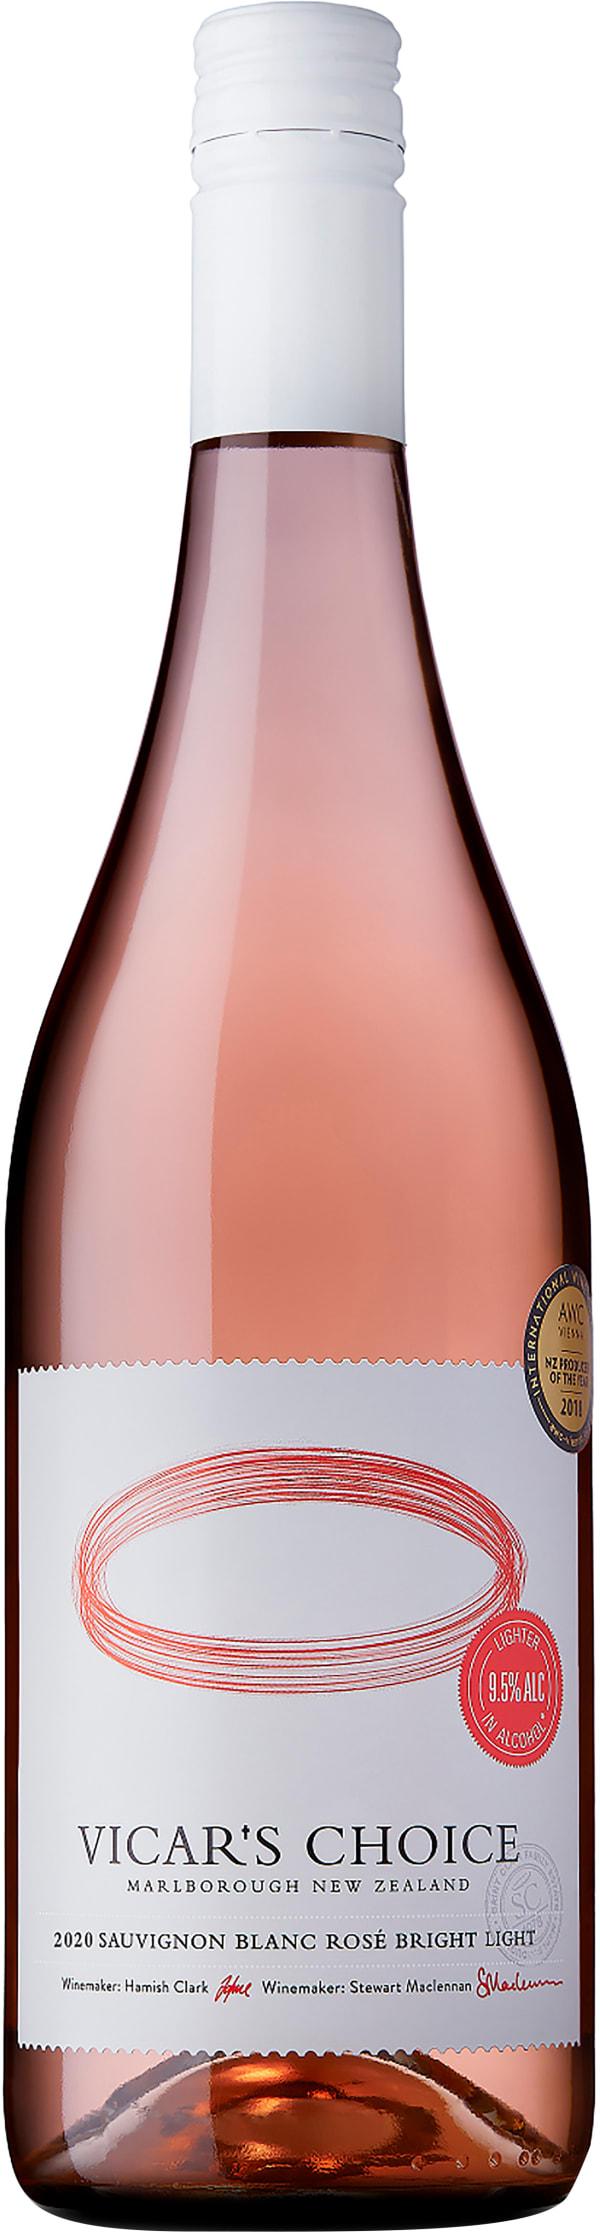 Saint Clair Vicar's Choice Sauvignon Blanc Rosé Bright Light 2020